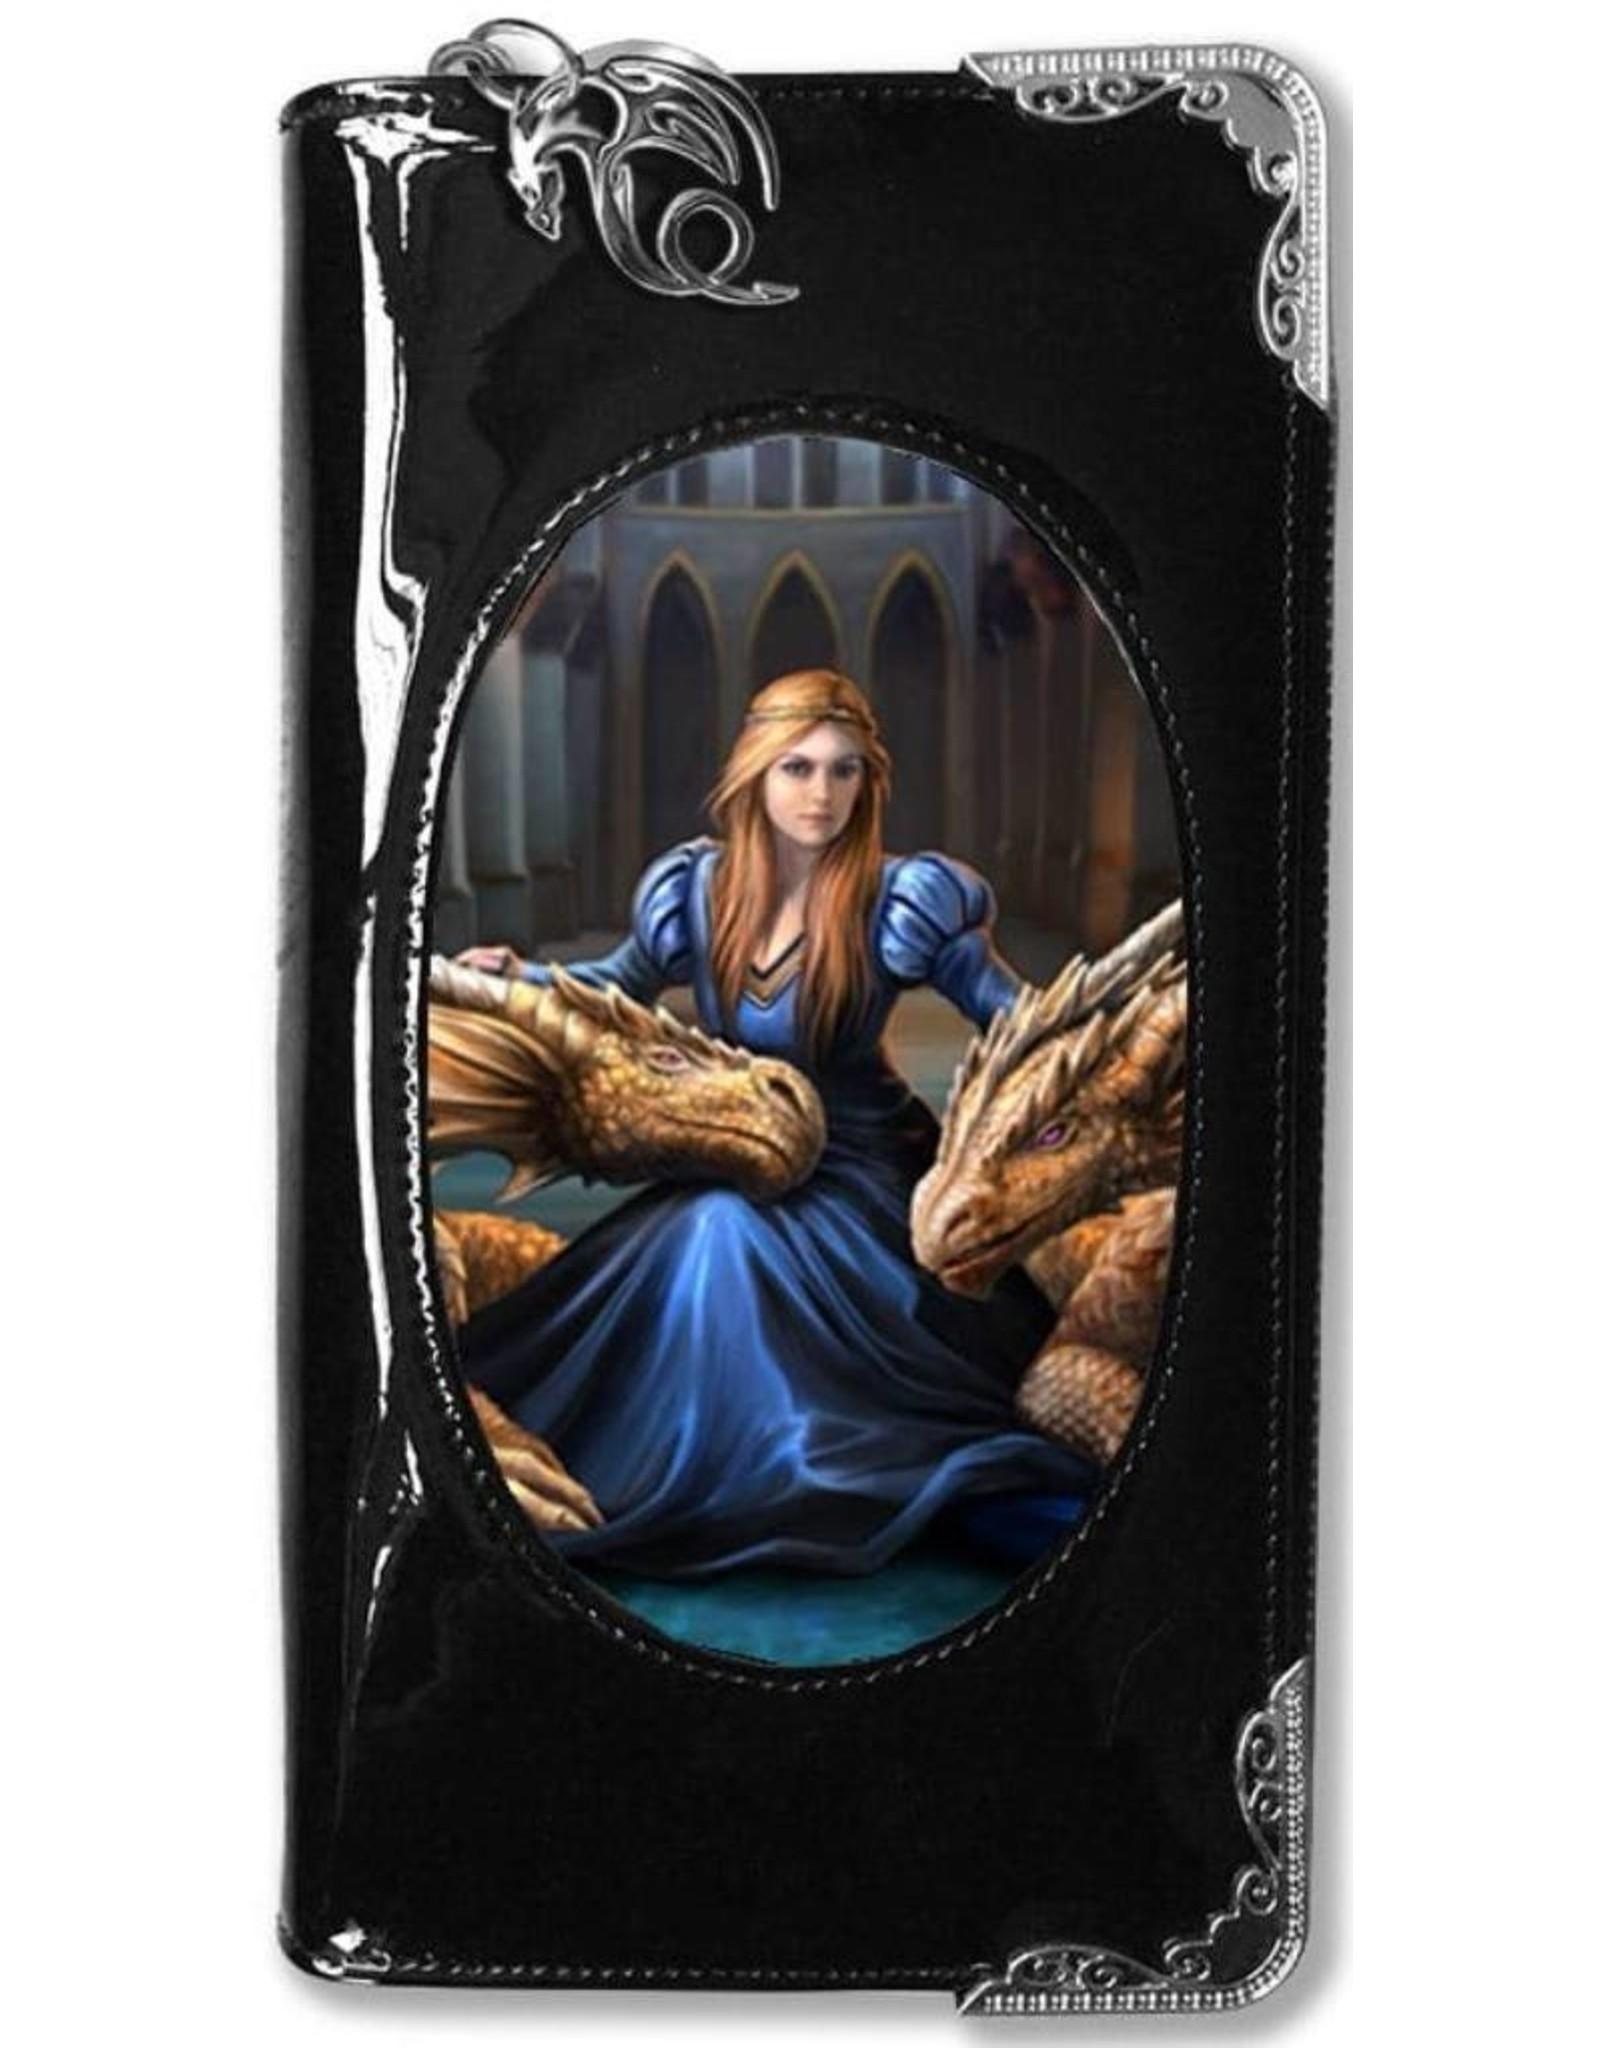 Anne Stokes Fantasy tassen en portemonnees - Anne Stokes 3D portemonnee Fierce Loyalty